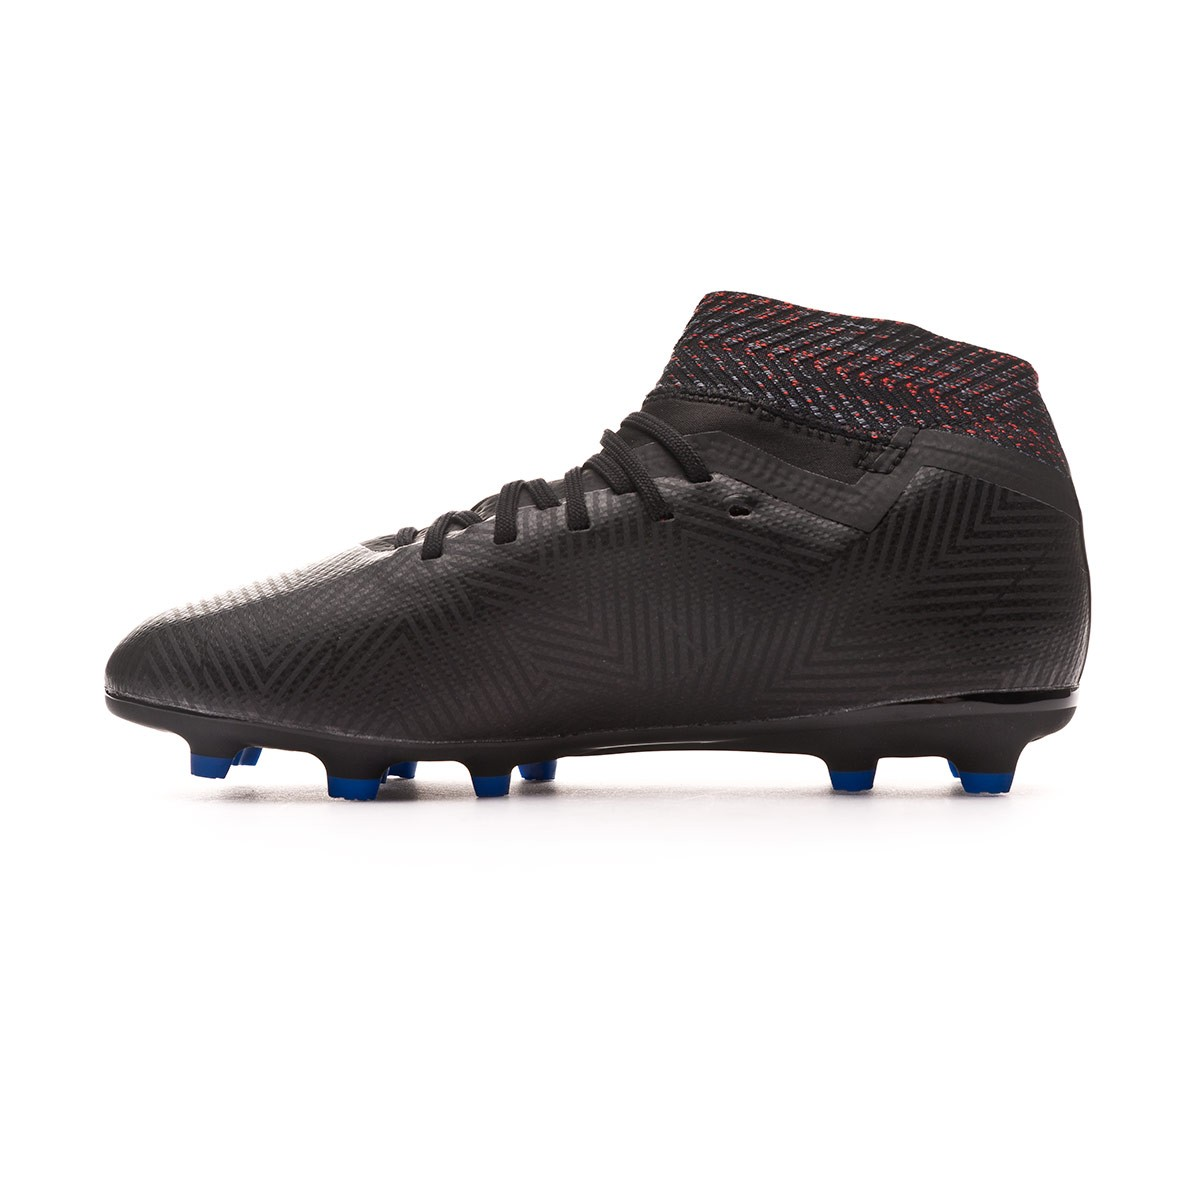 8d7910ea1 Football Boots adidas Kids Nemeziz 18.3 FG Core black-Football blue-Active  red - Football store Fútbol Emotion